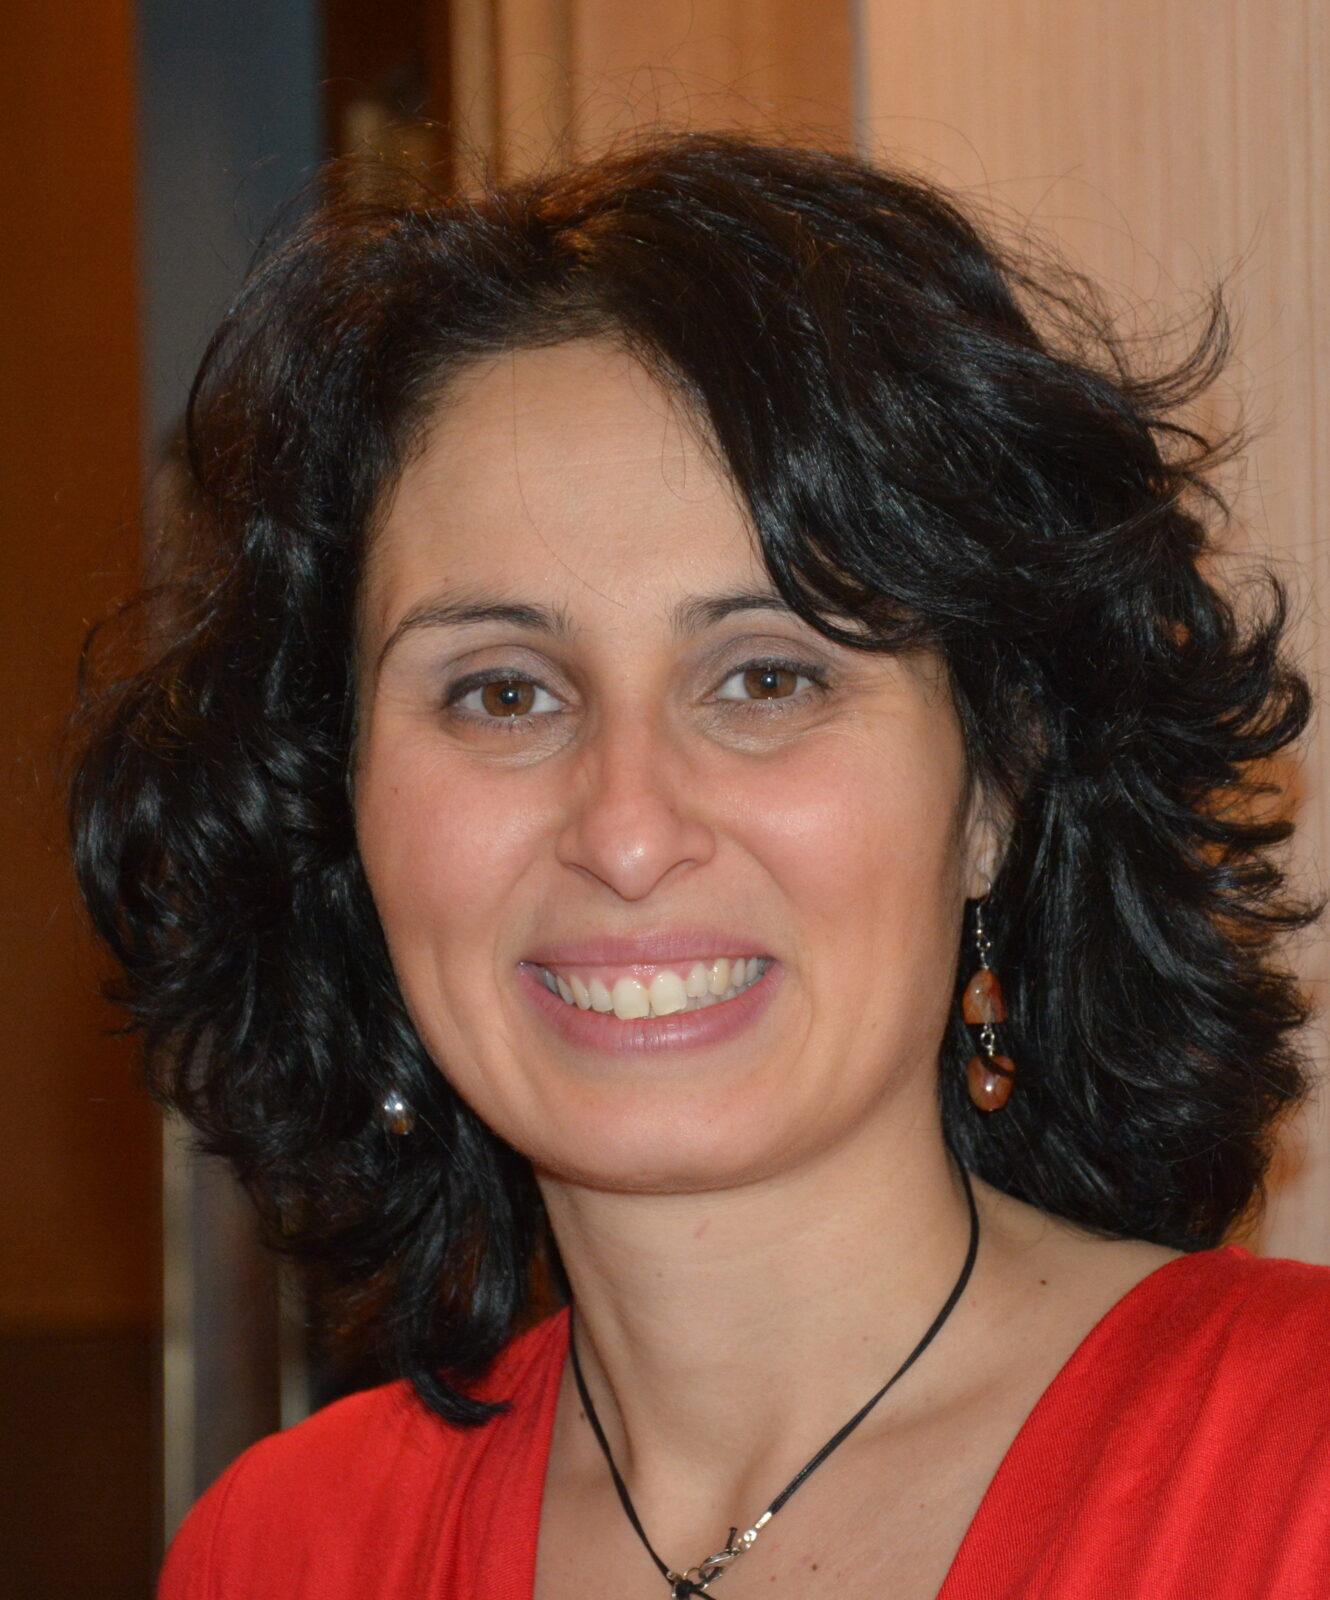 Dott.ssa Angela Spadafranca